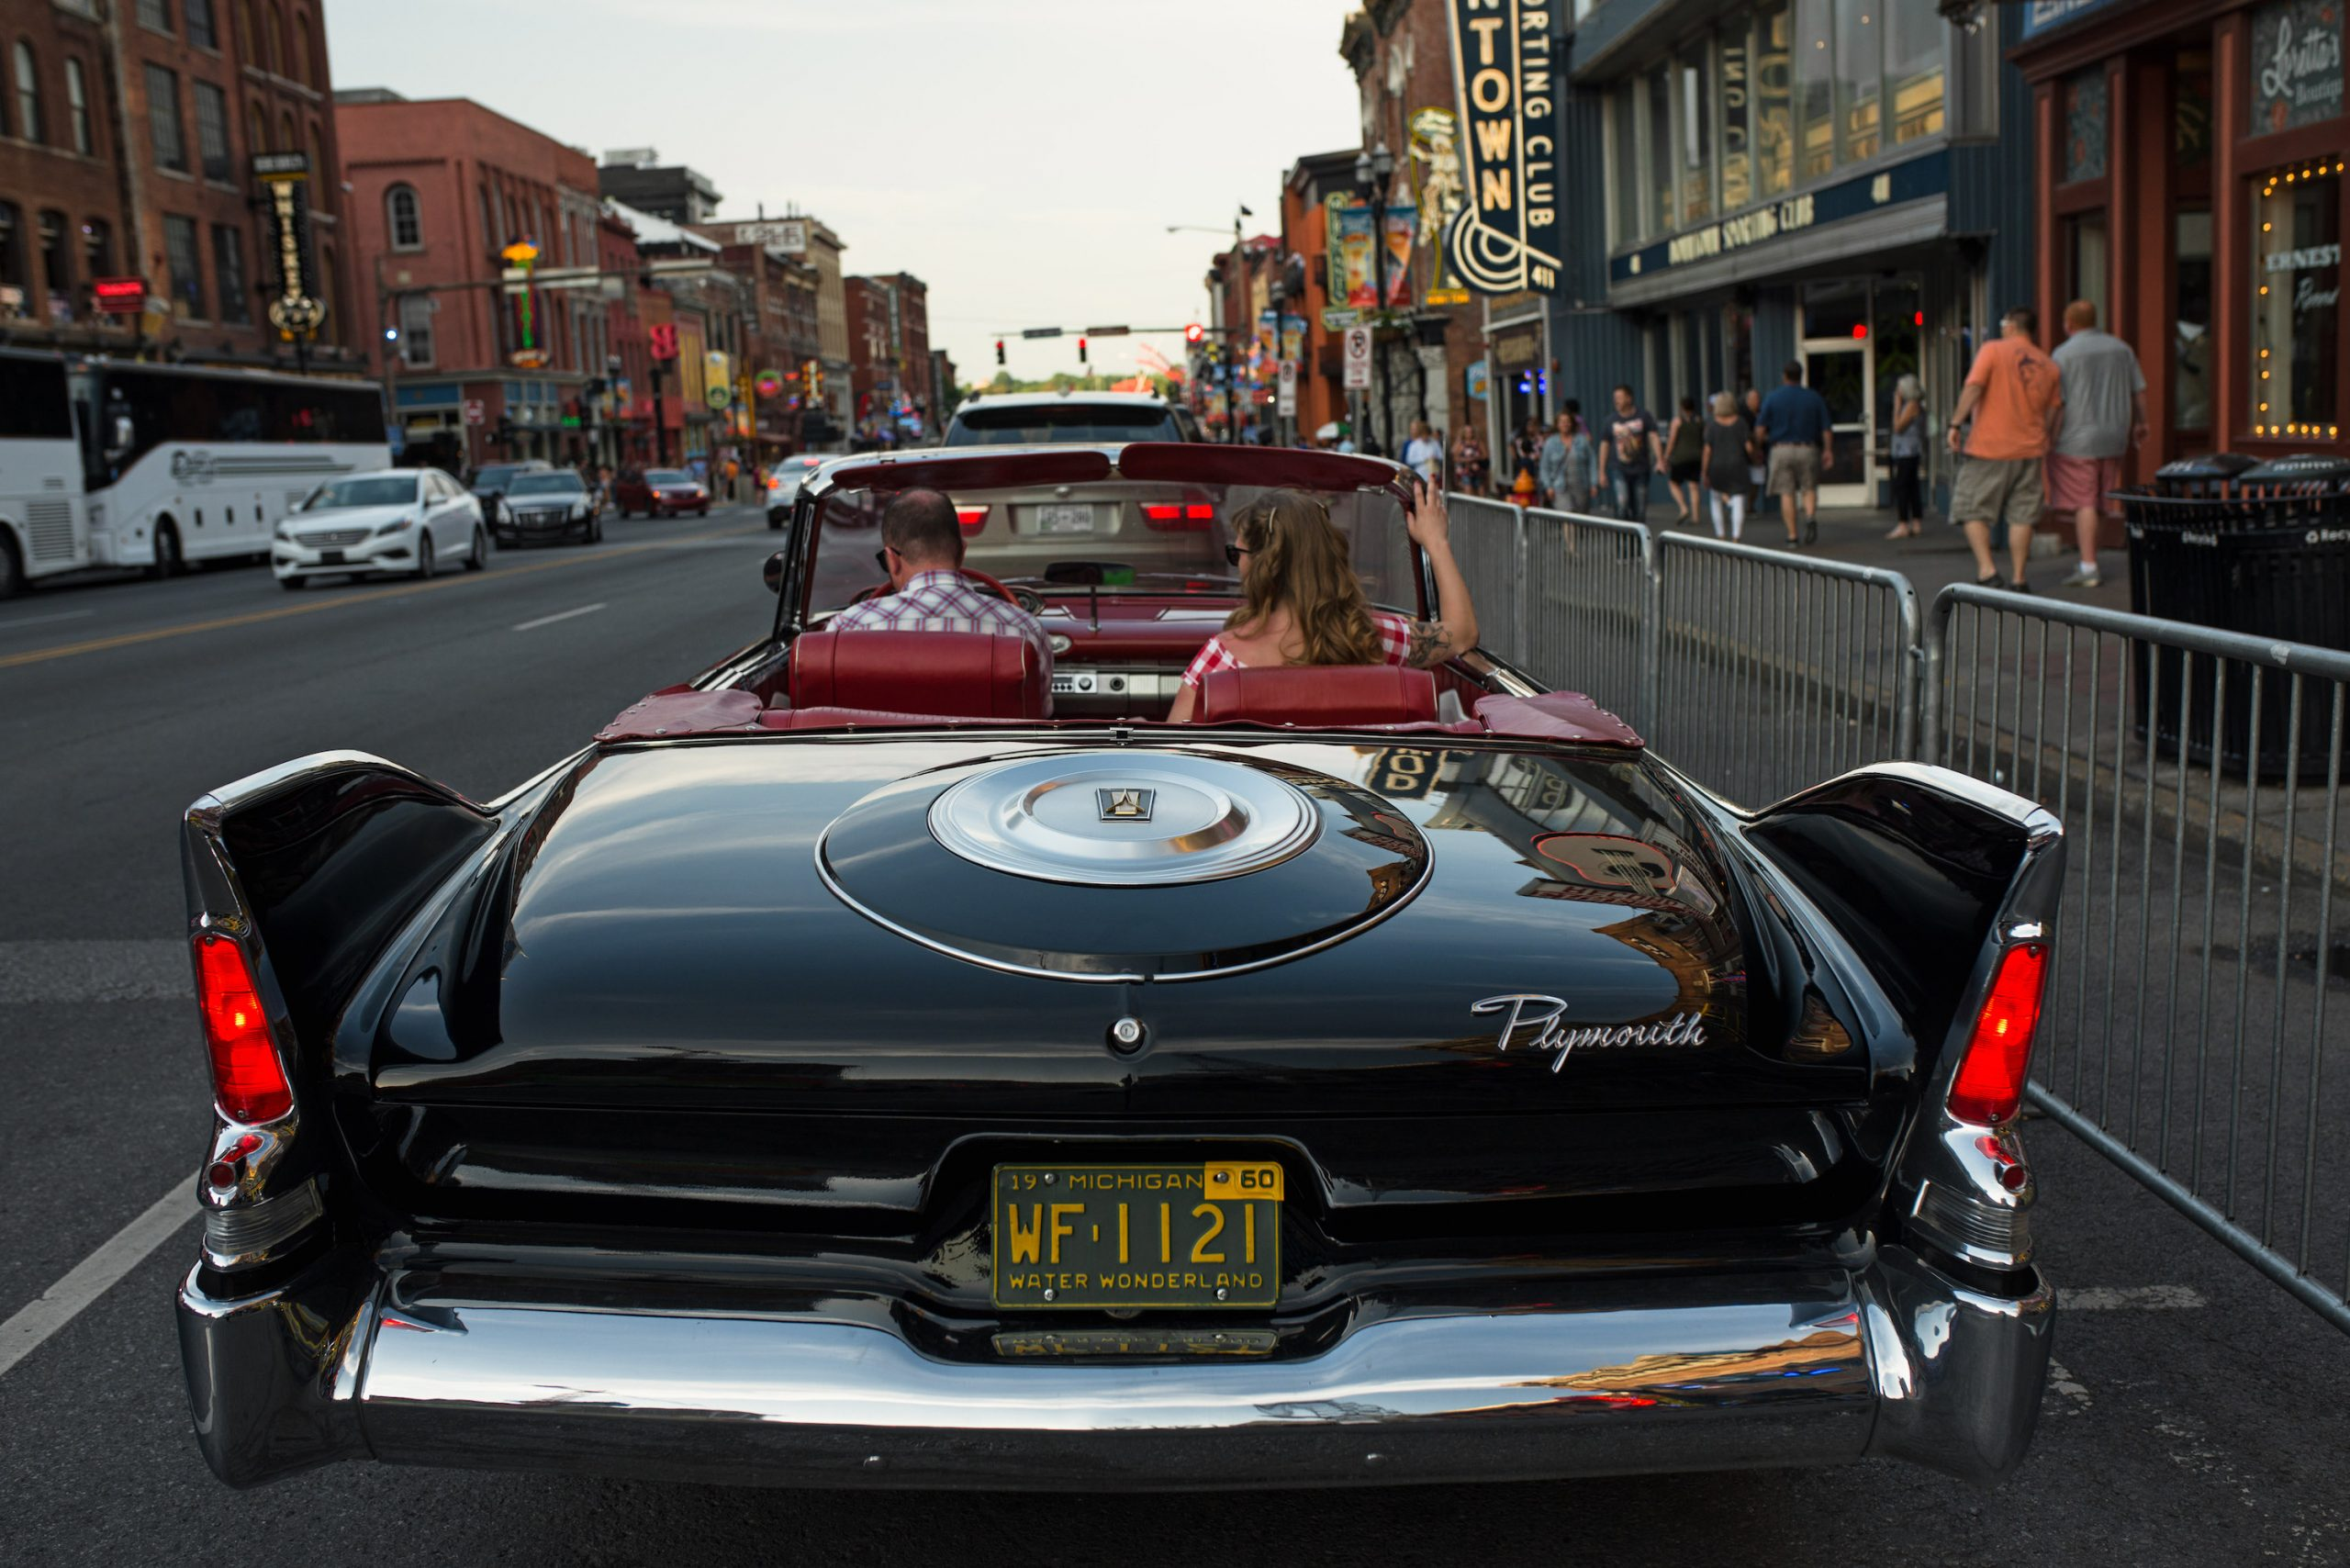 Plymouth Fury Rear